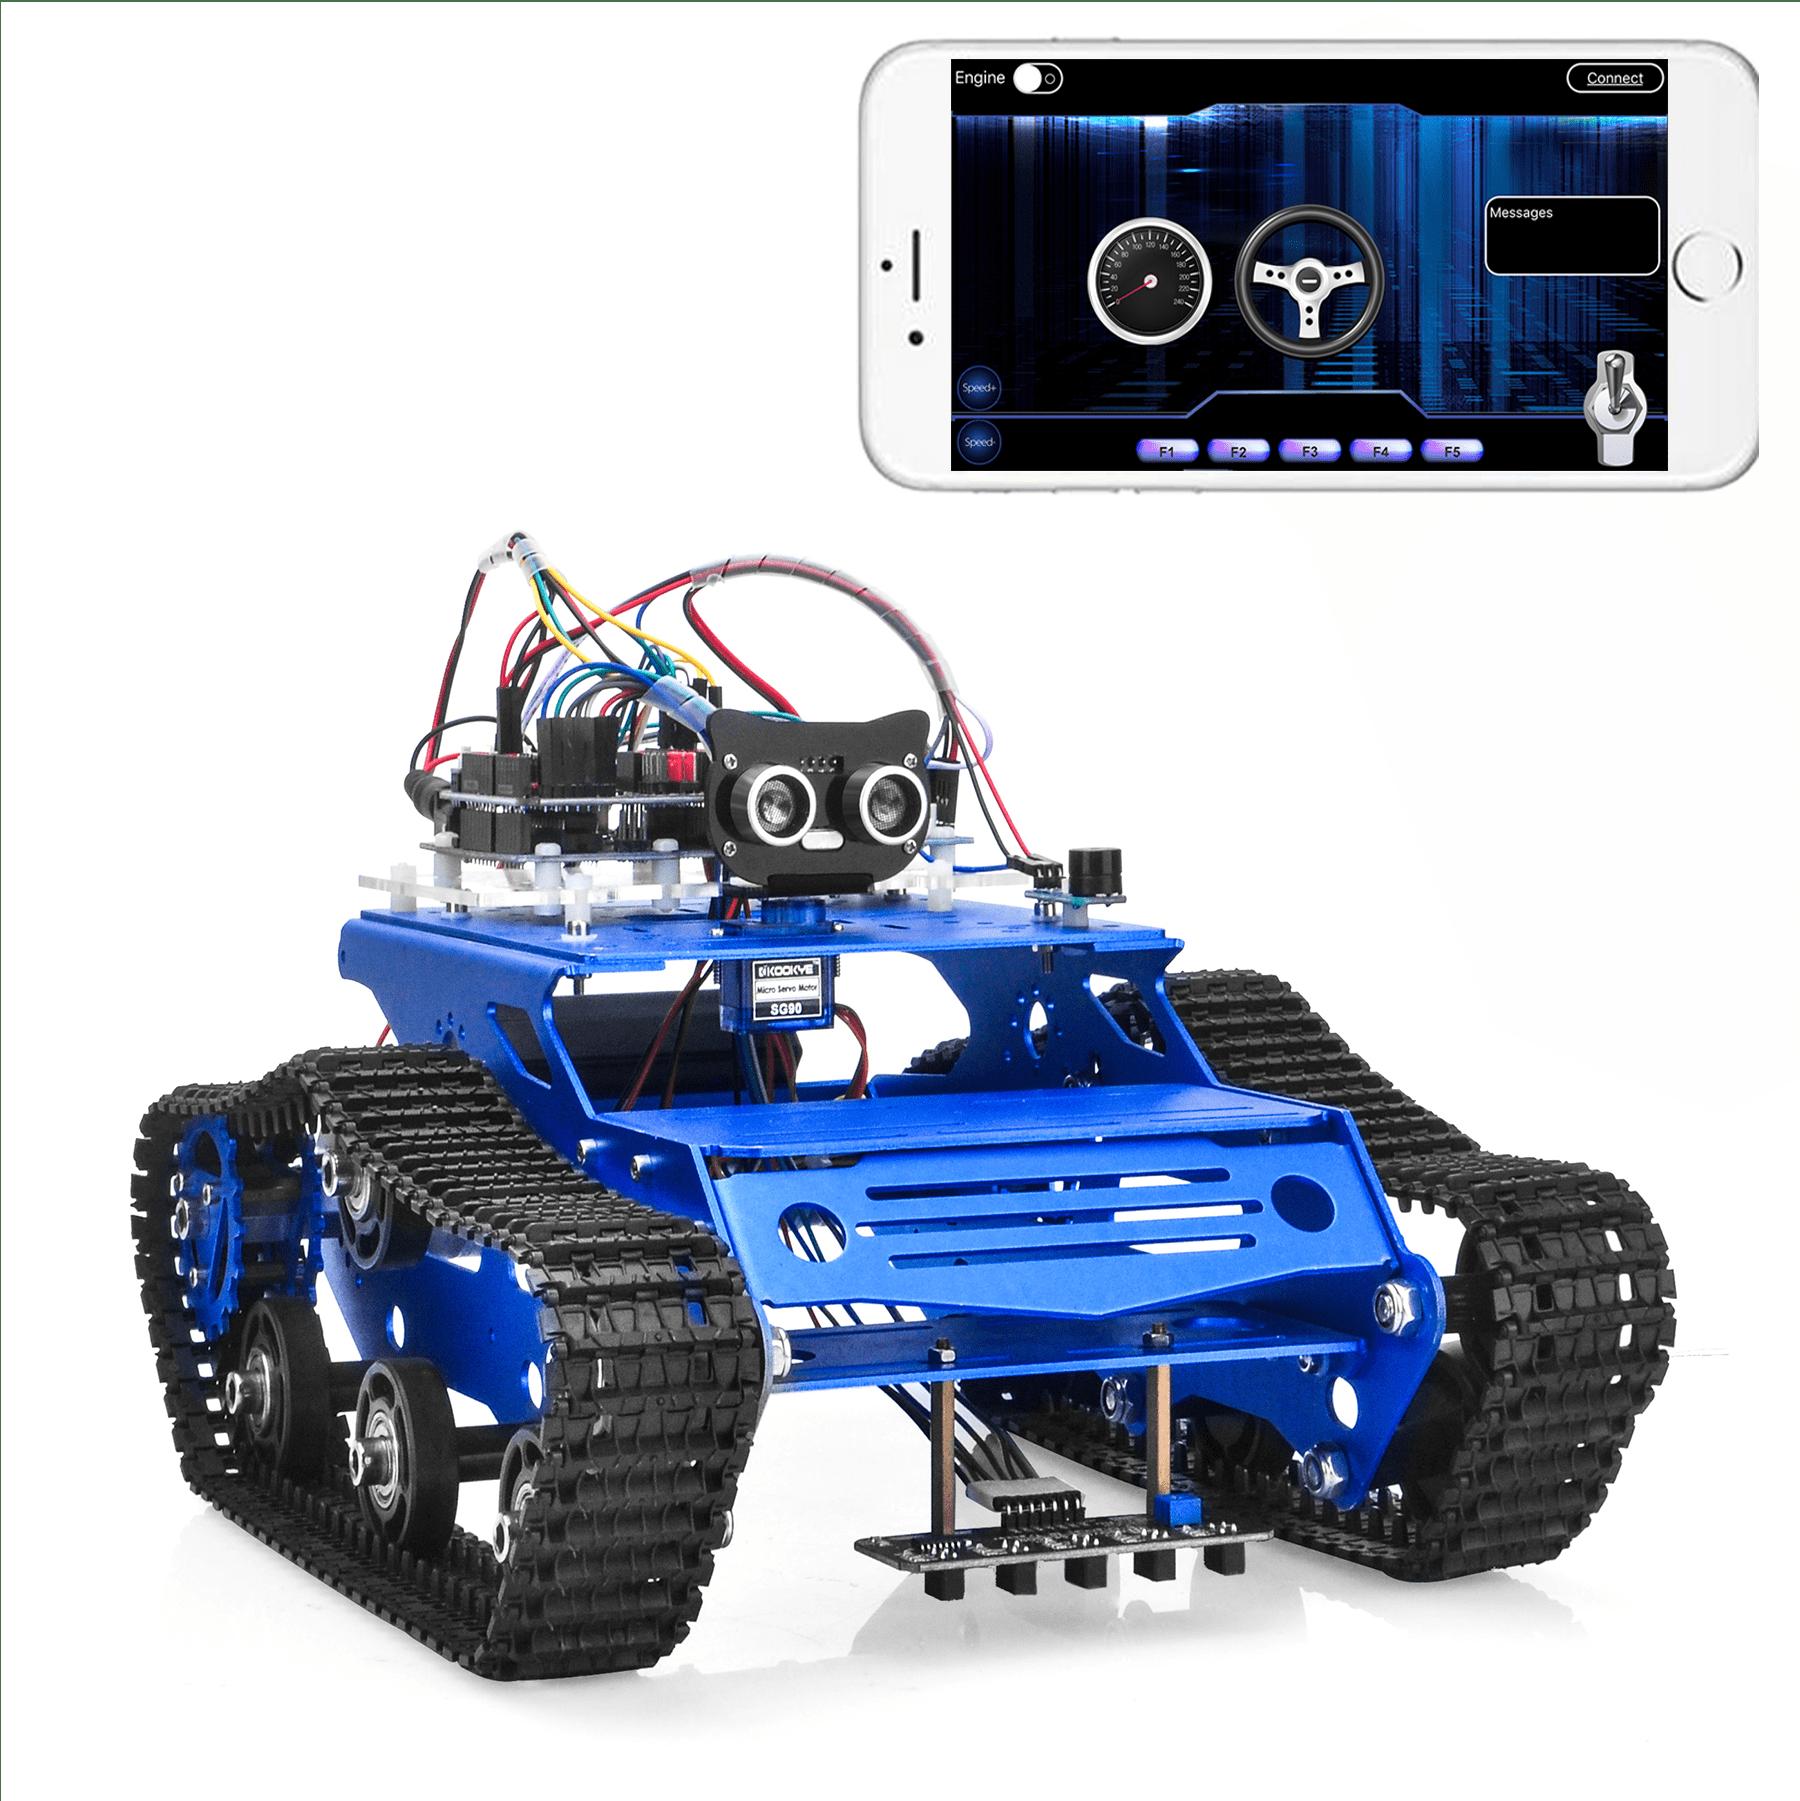 Robot Tank Car Kit V2.0 Lesson7: Simulator driving with bluetooth